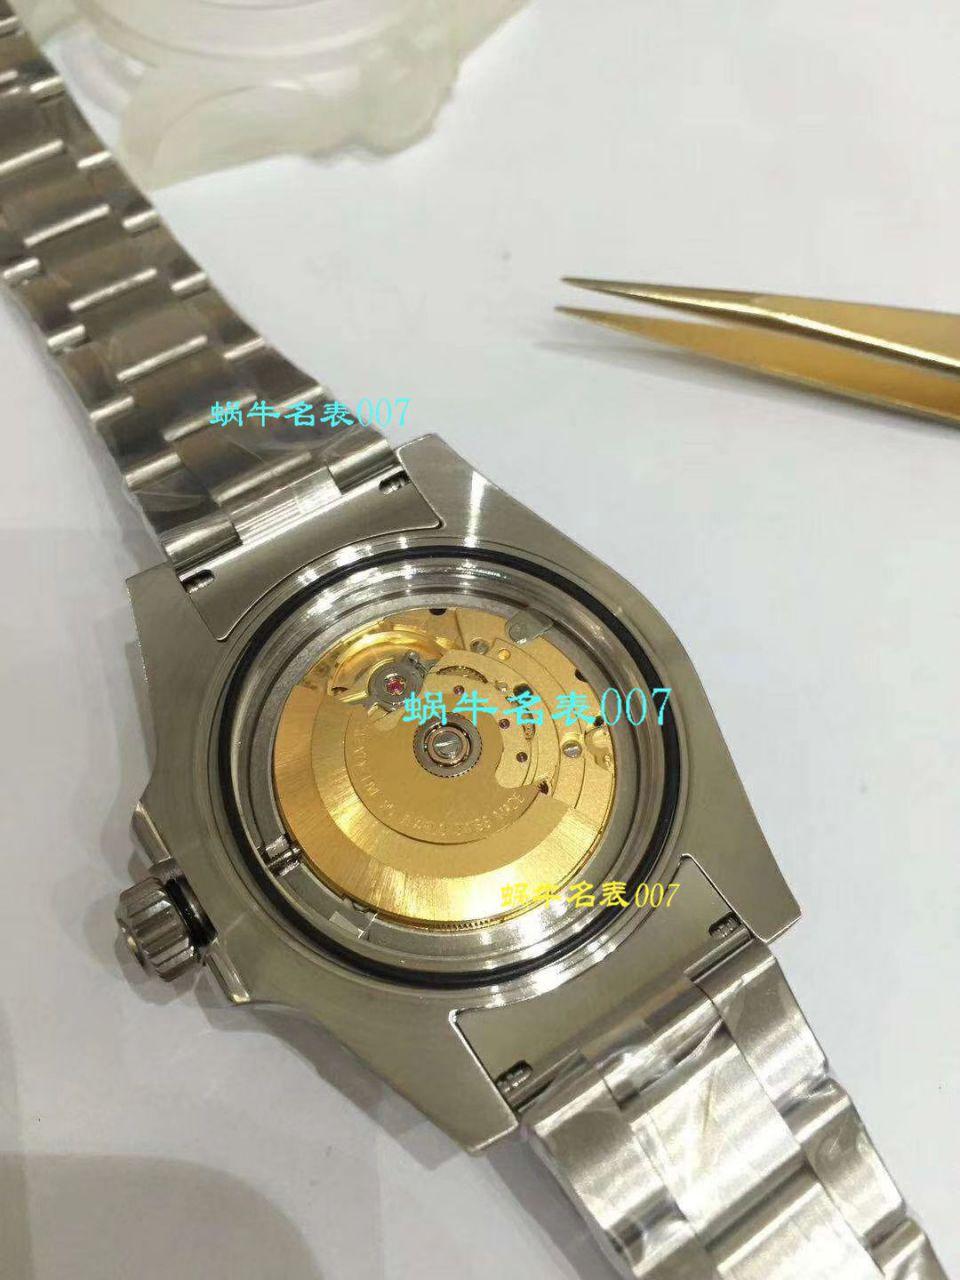 【NOOB厂V9版本一比一超A复刻手表】劳力士潜航者型系列116610LV-97200 绿盘腕表【劳力士绿水鬼】、劳力士潜航者型系列116610LN-97200 黑盘腕表(黑水鬼) / R295